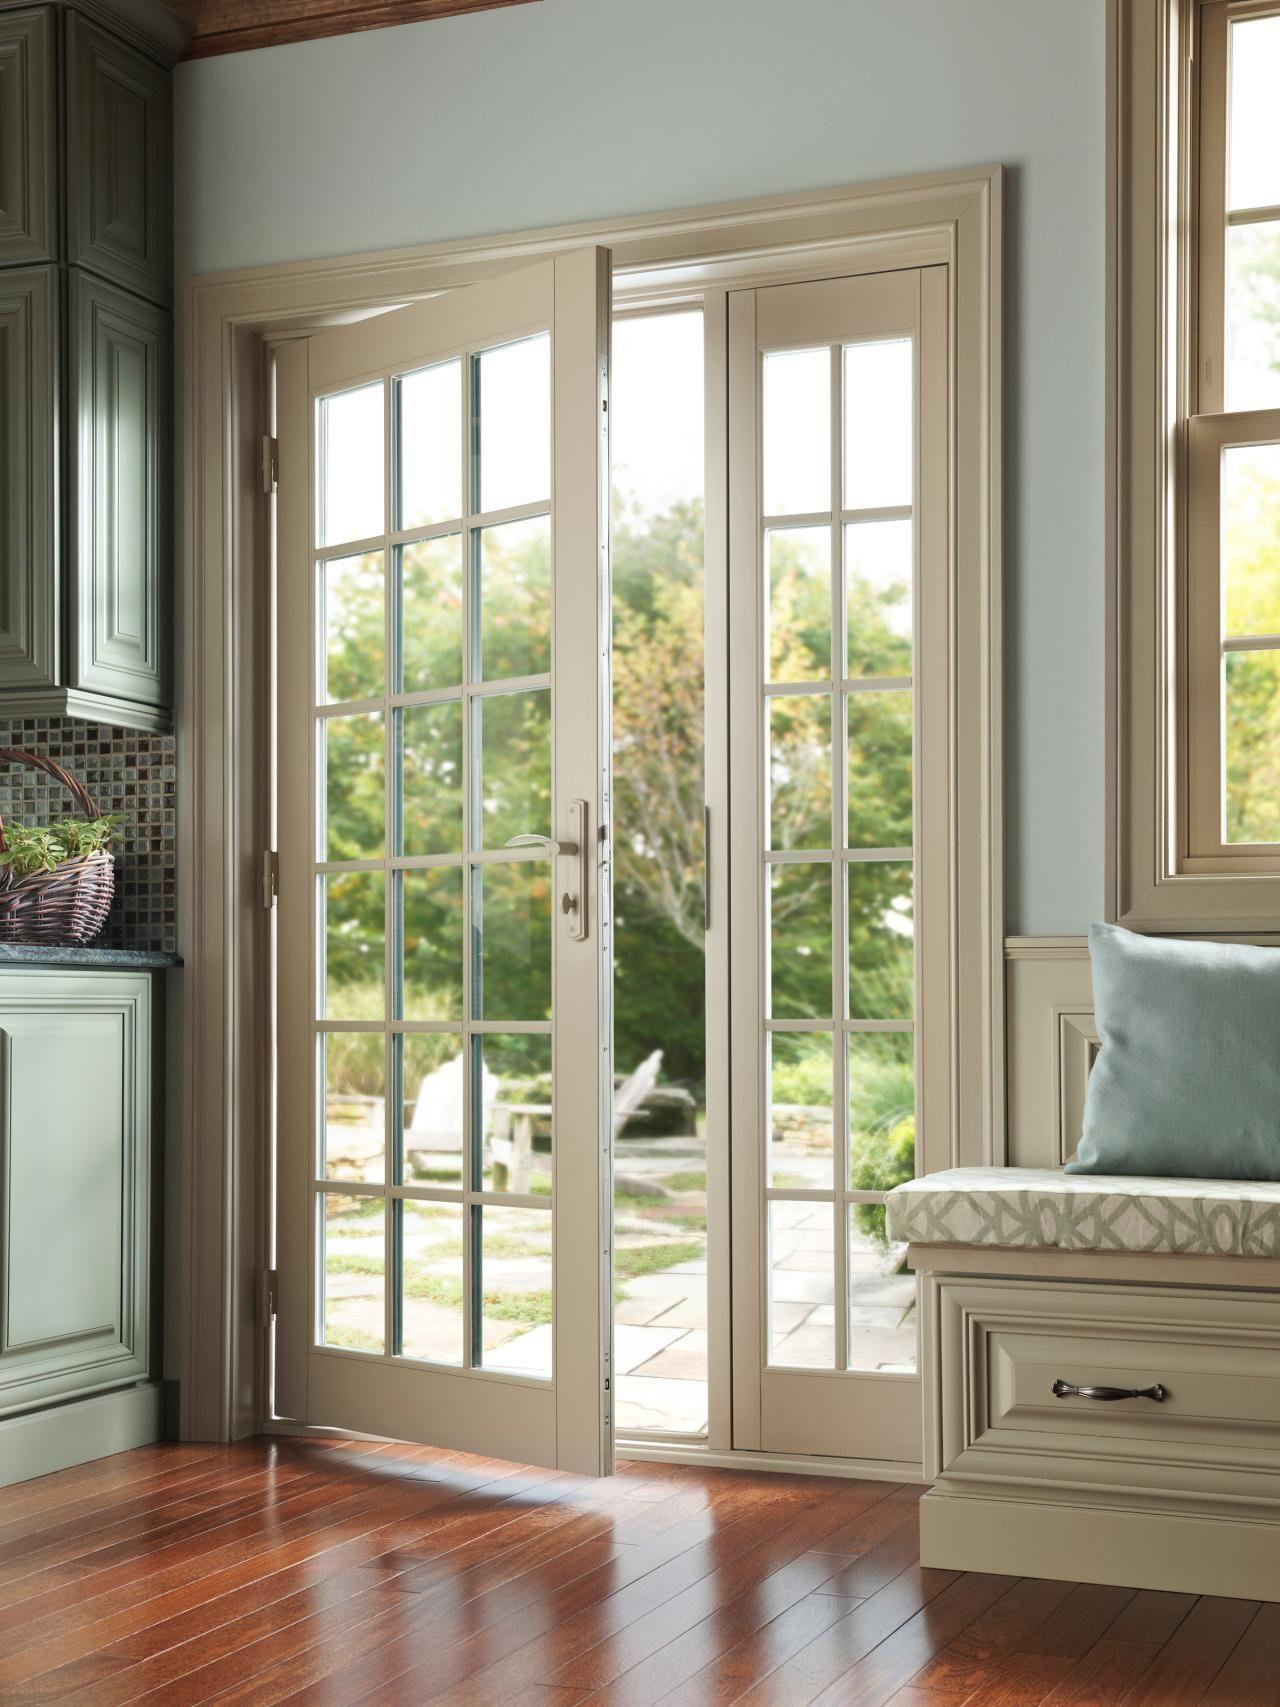 Best 25+ Hinged Patio Doors Ideas On Pinterest | Patio Doors, Glass Doors  And Modern Patio Doors